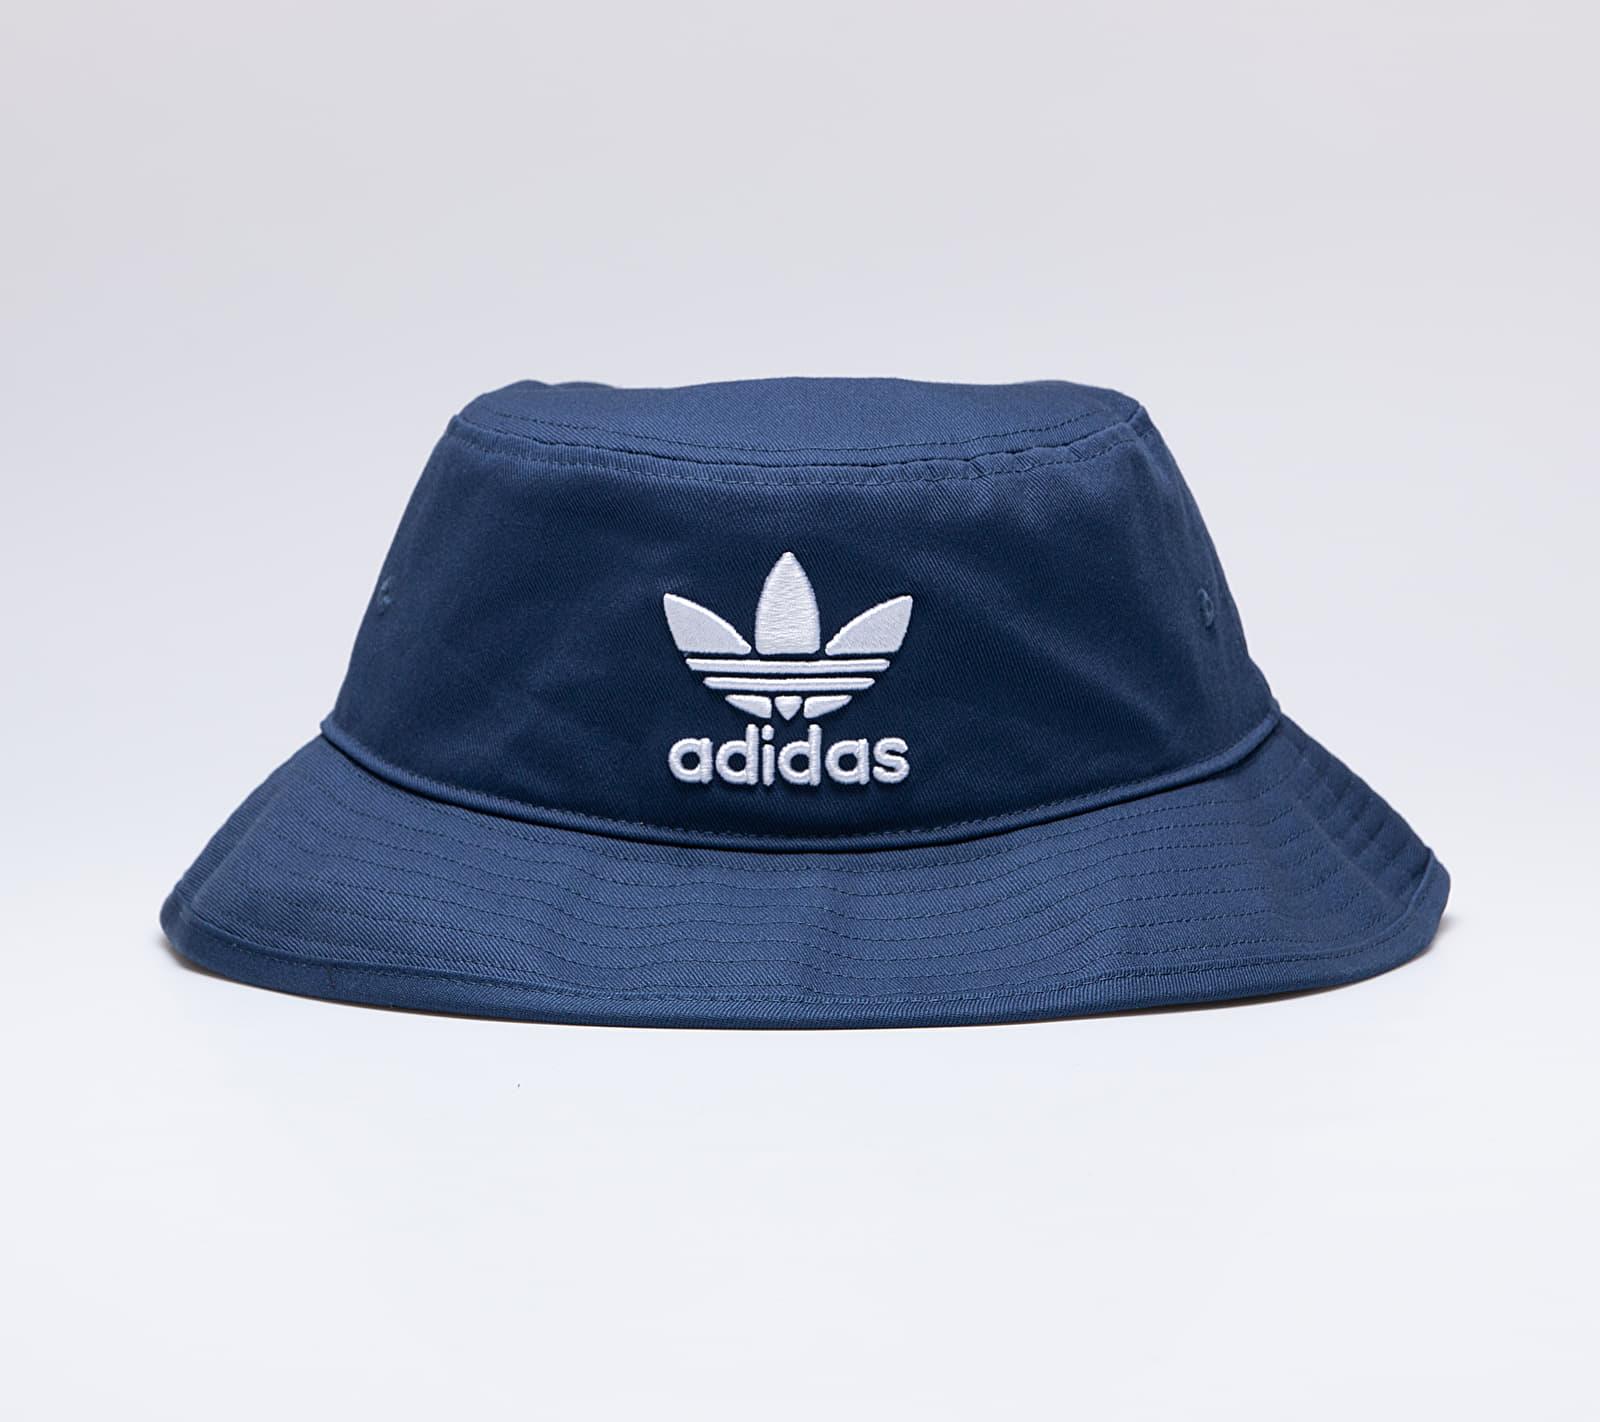 adidas Adicolor Bucket Hat Night Marine/ White, Blue